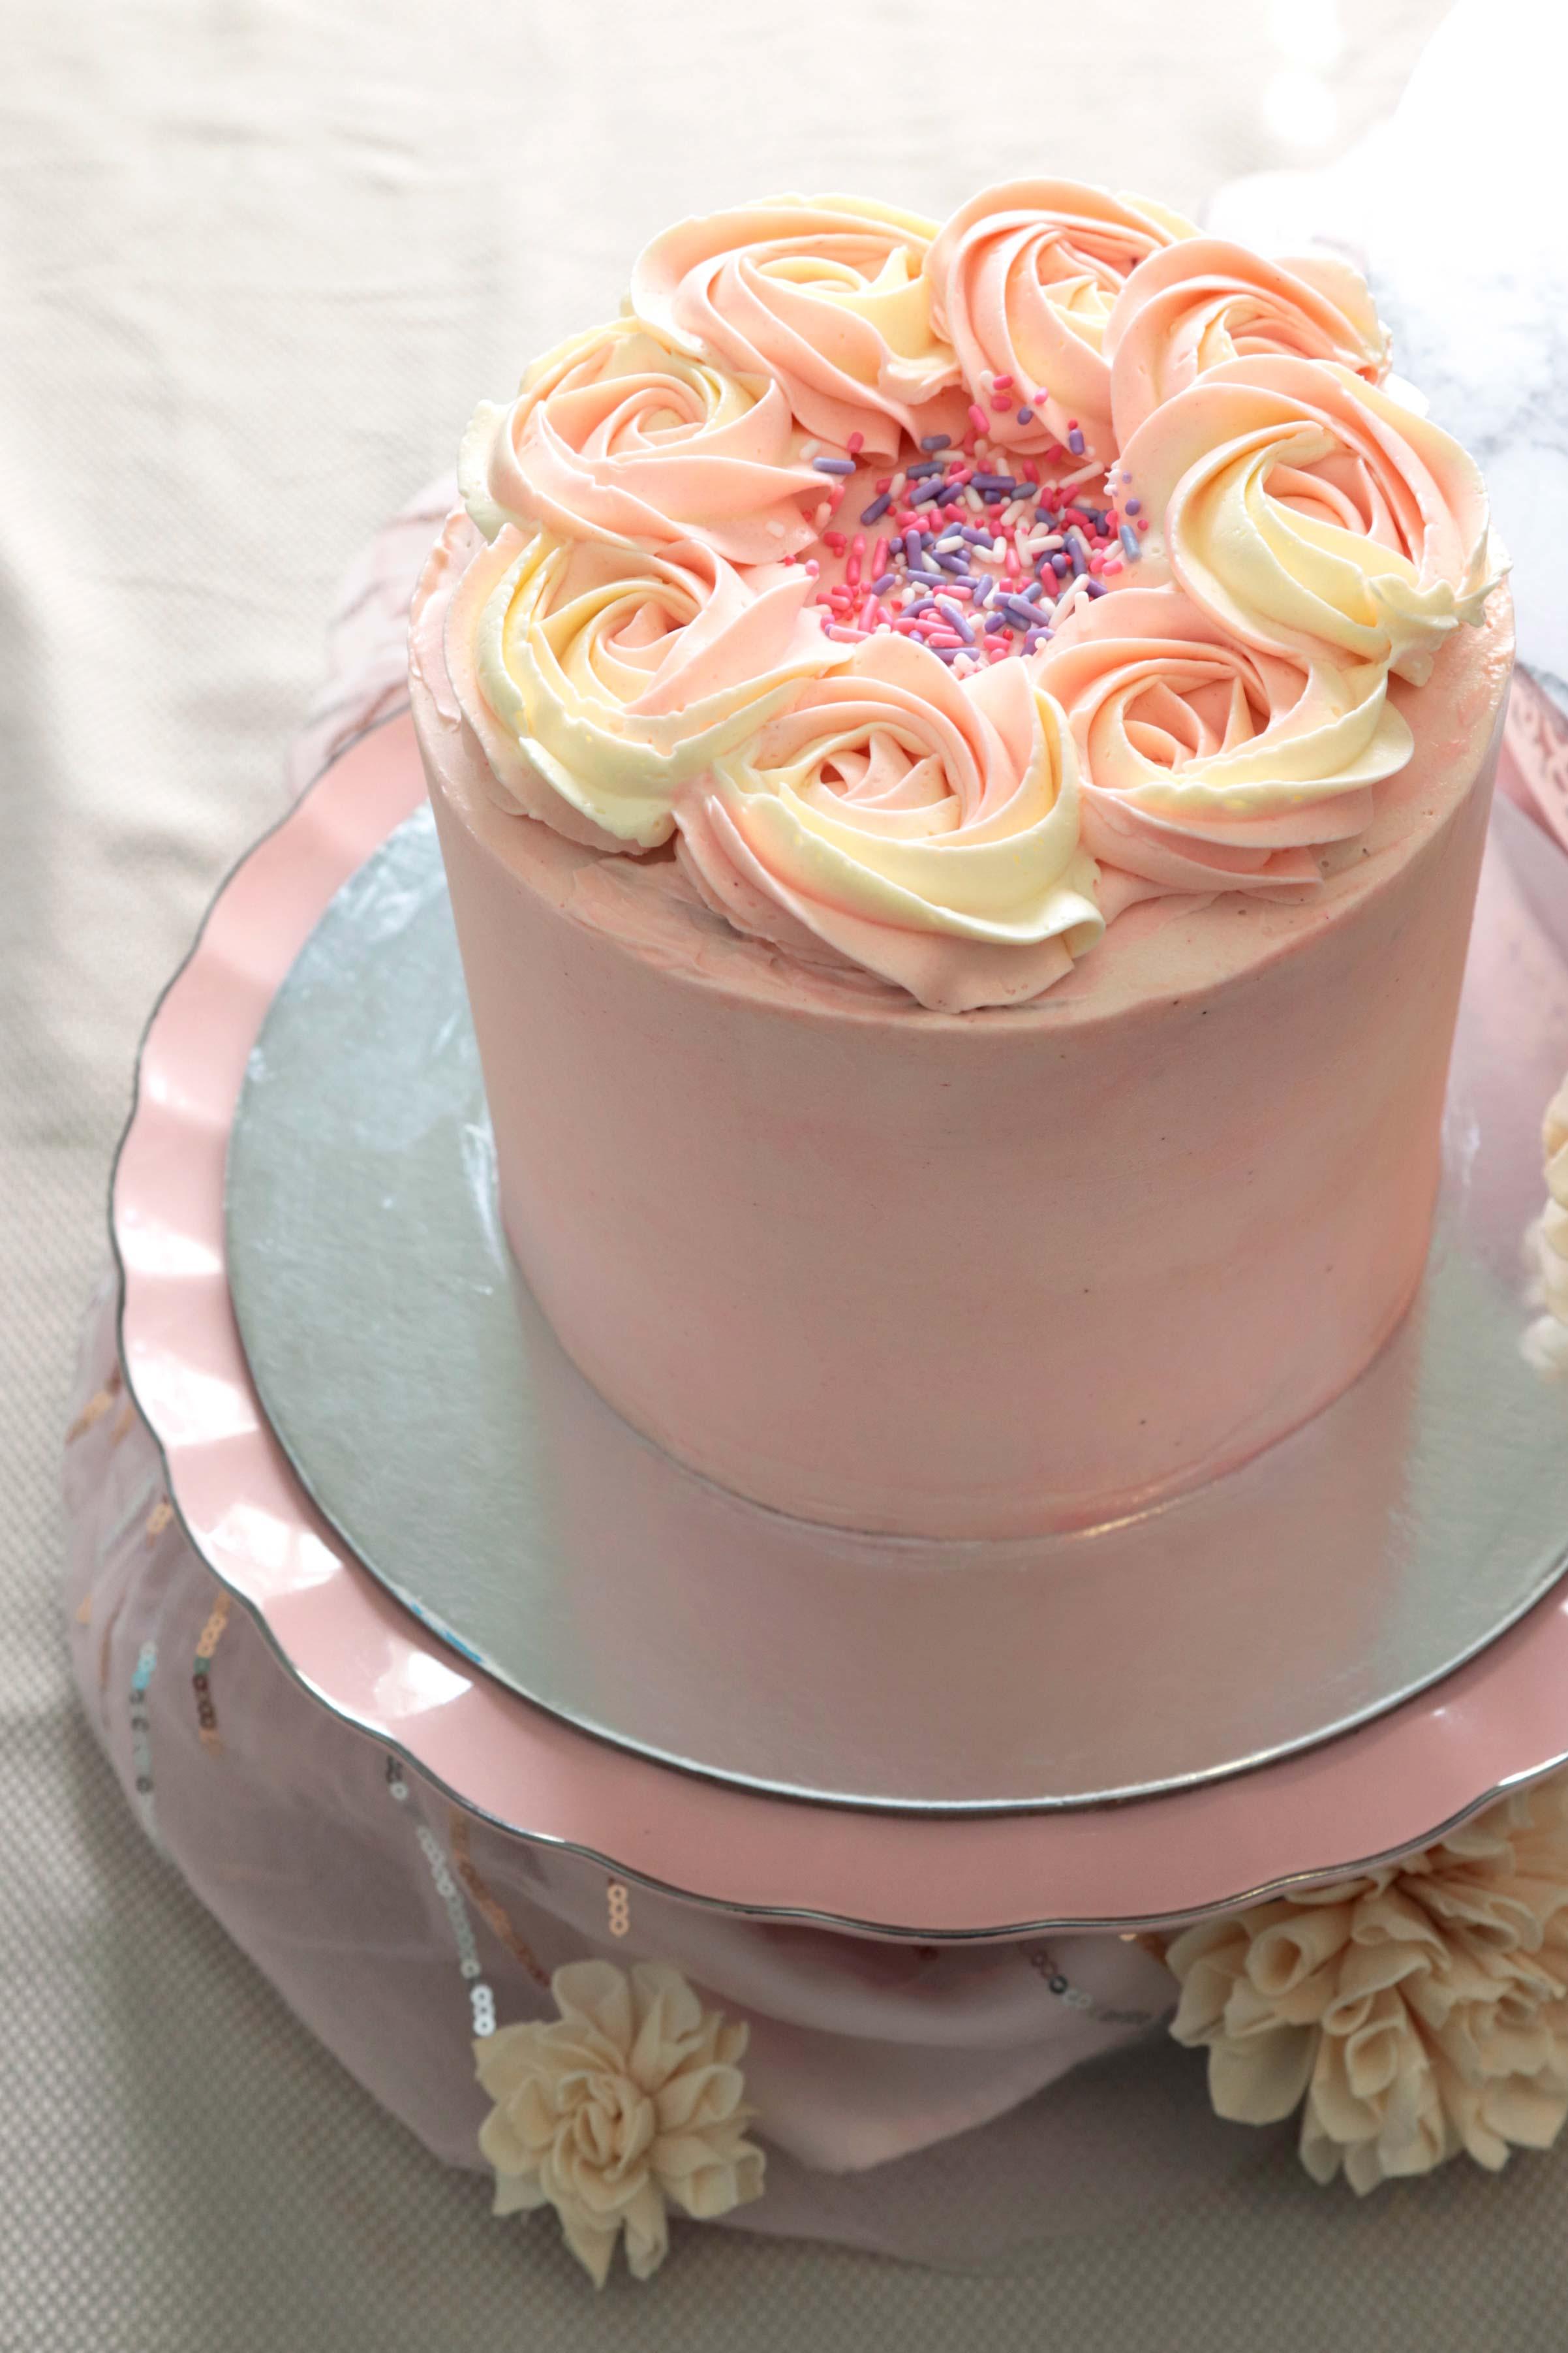 The_Little_Cake_Maker_Perth_Baker_CustomCakes_DayCakes_Slices_Tarts_Cupcakes_Day_Cakes_1.jpg